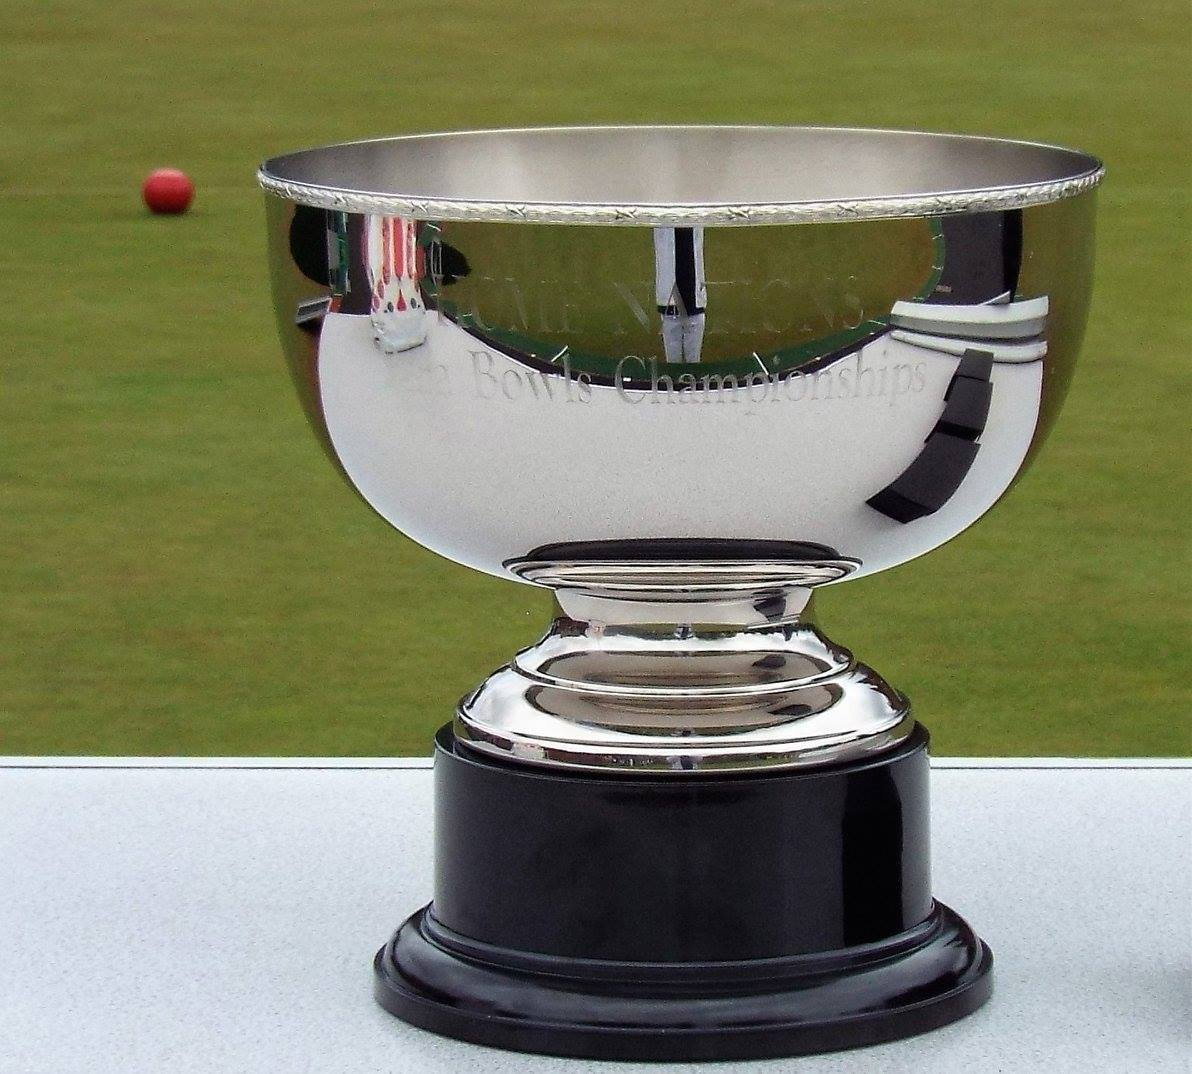 2016 Home Nations Bowls Tournament trophy